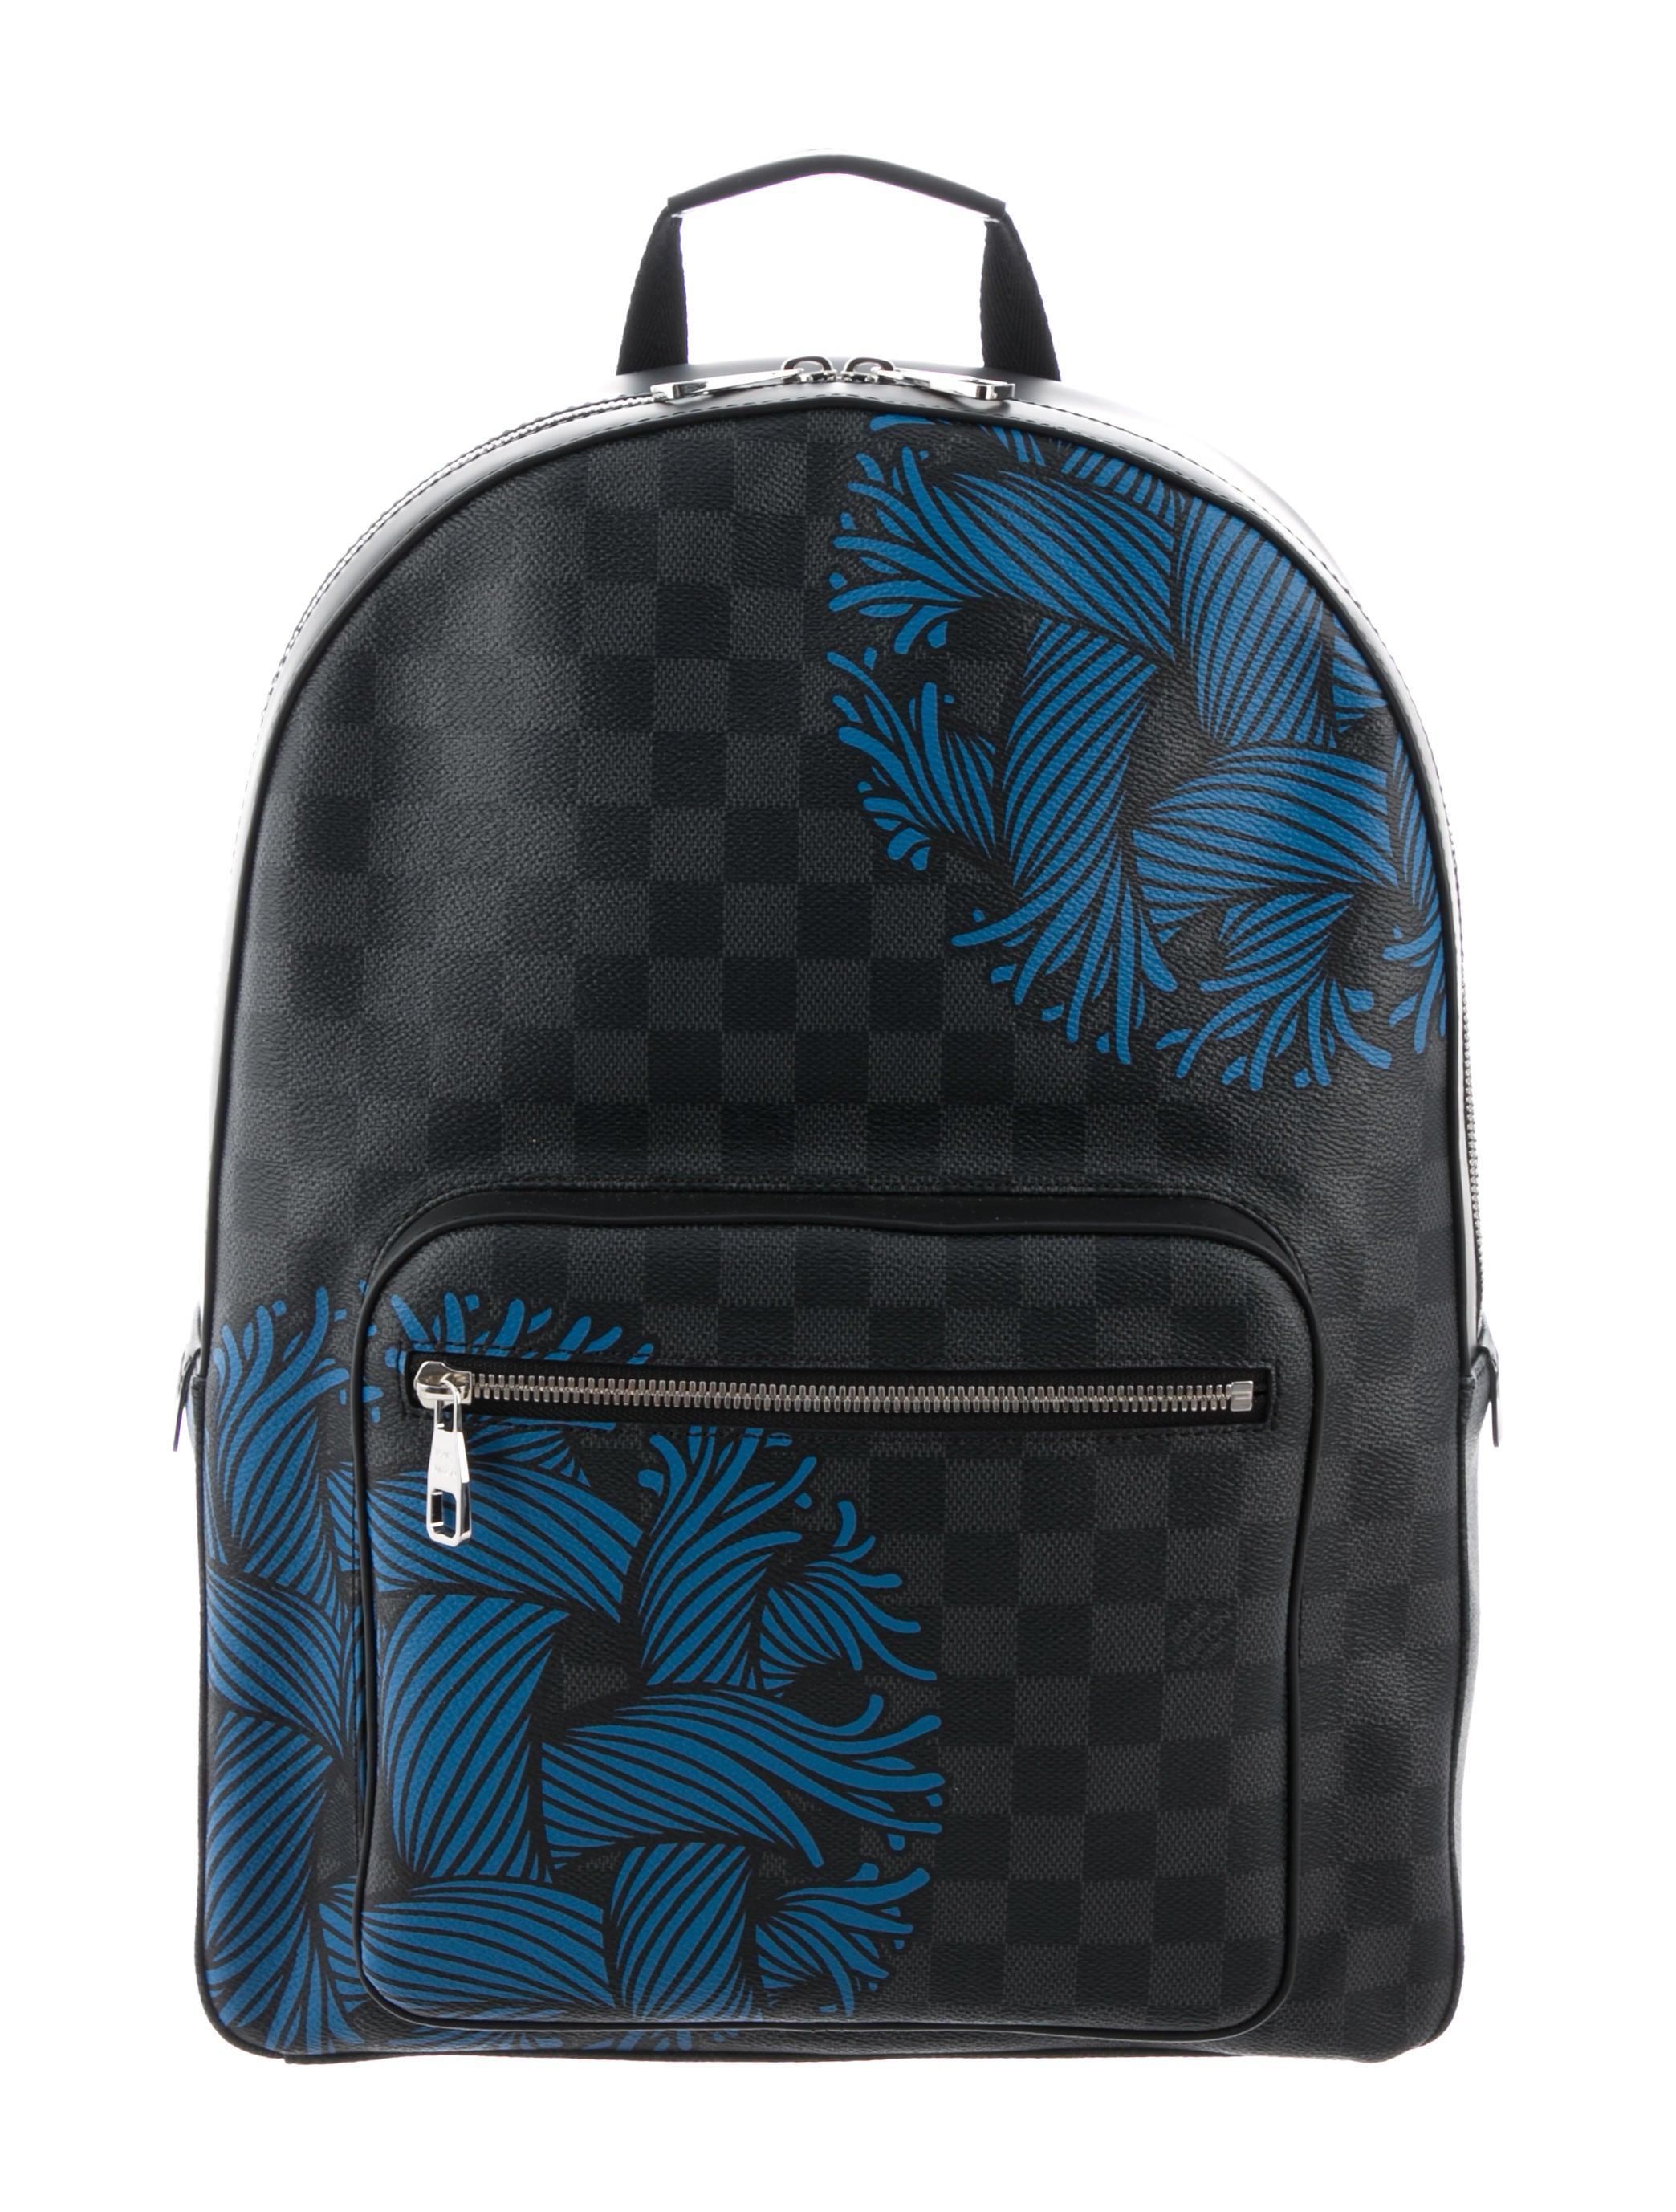 Louis Vuitton 2016 Damier Graphite Rope Josh Backpack - Bags ... b254f62d6b25a